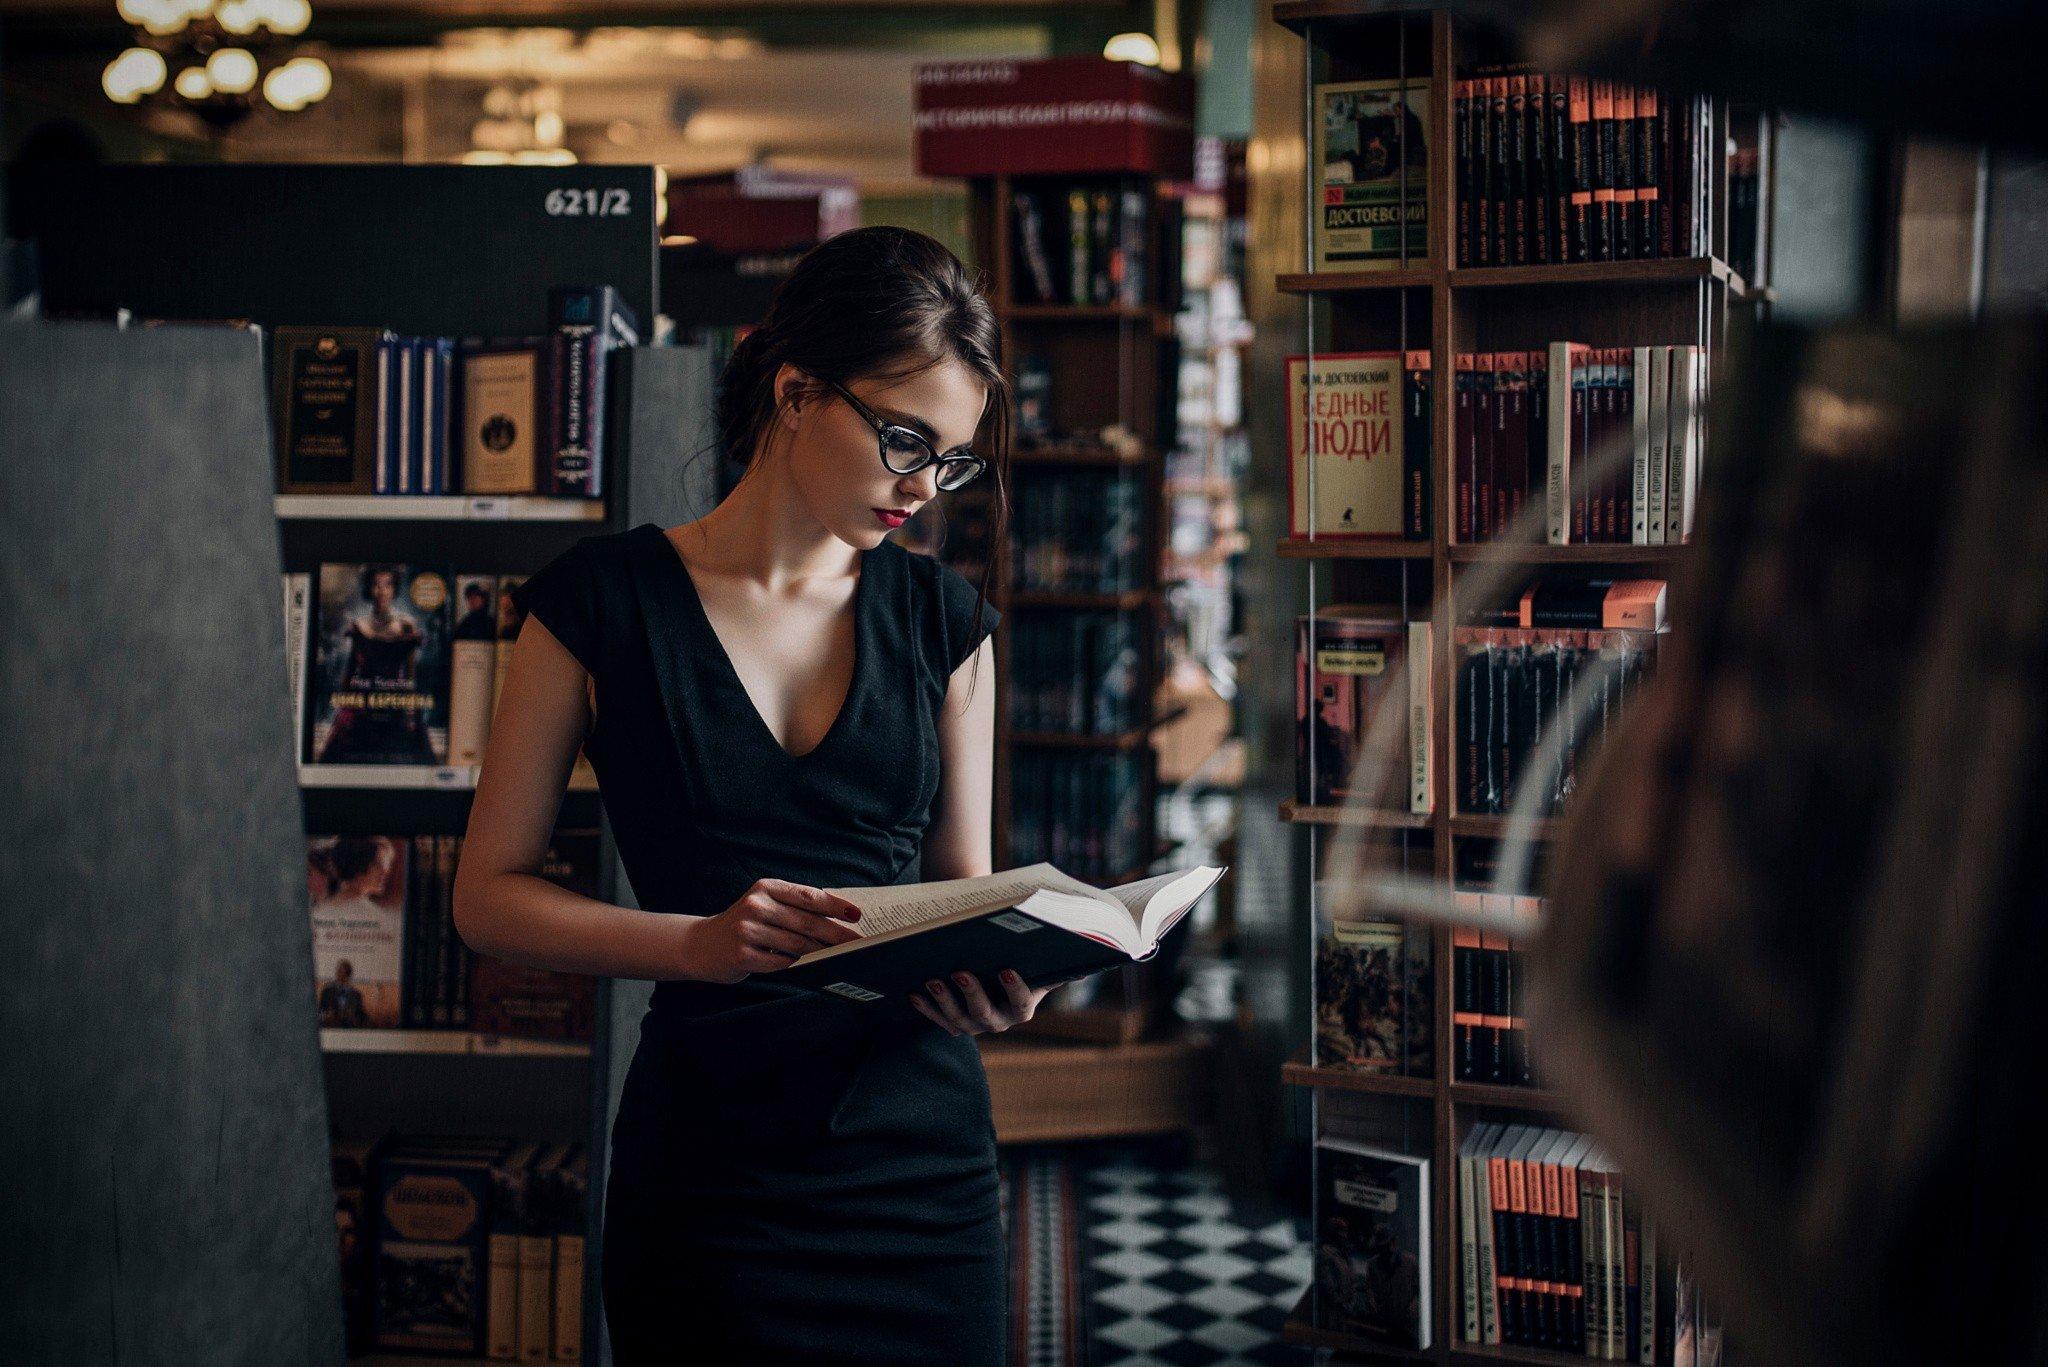 women, Russian, Books, Library, Book store Wallpaper